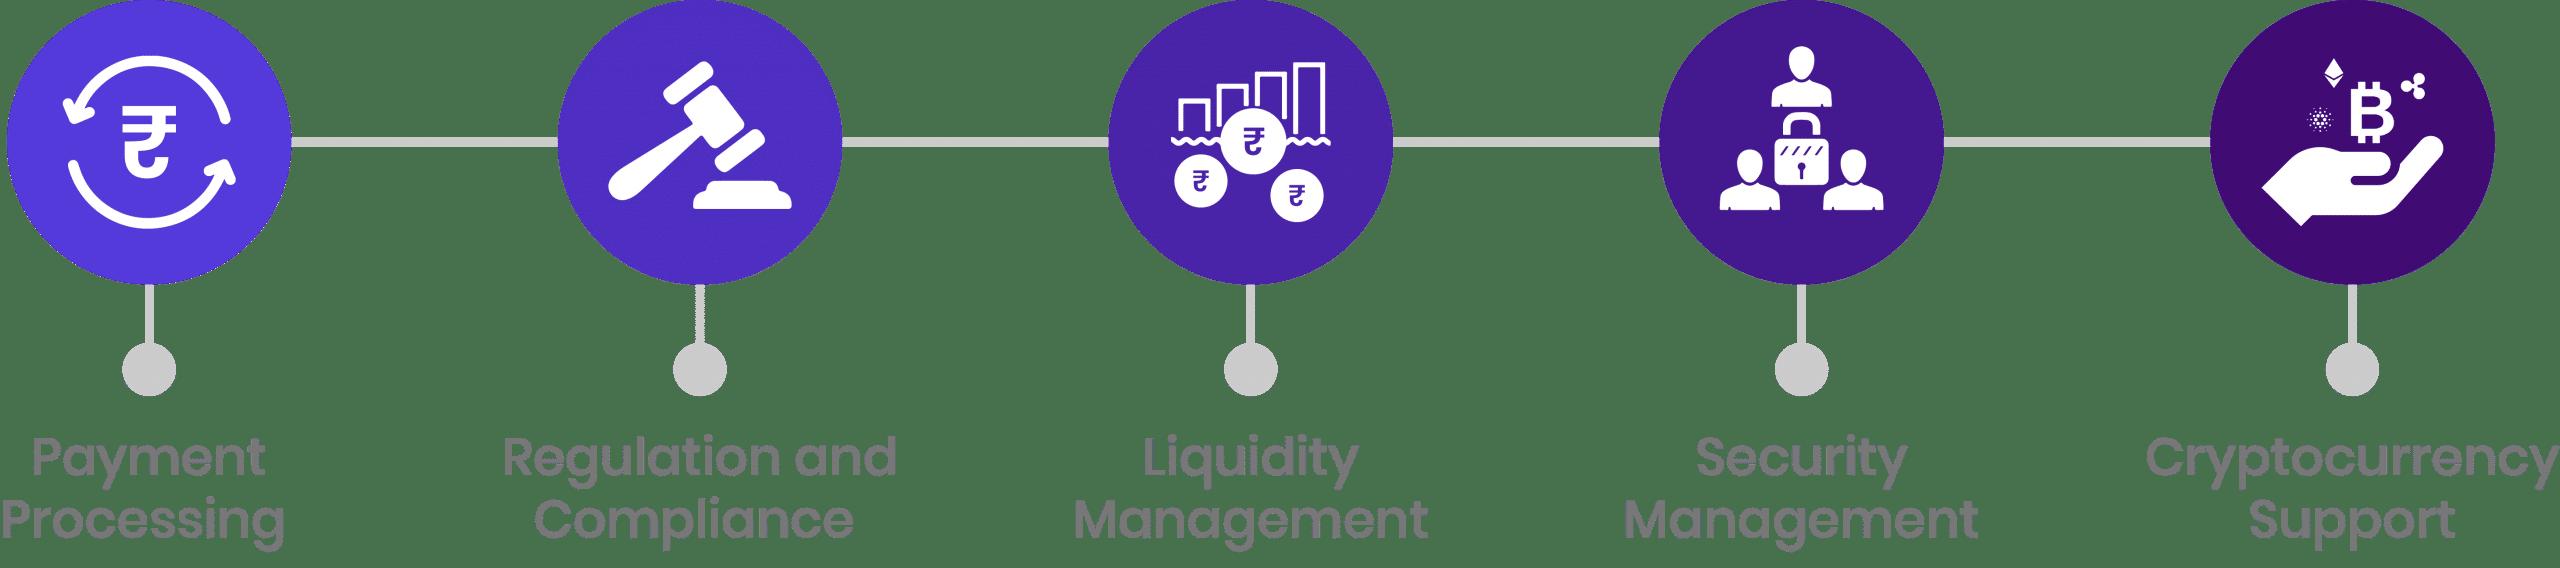 Steps to build Crypto Exchange Platform